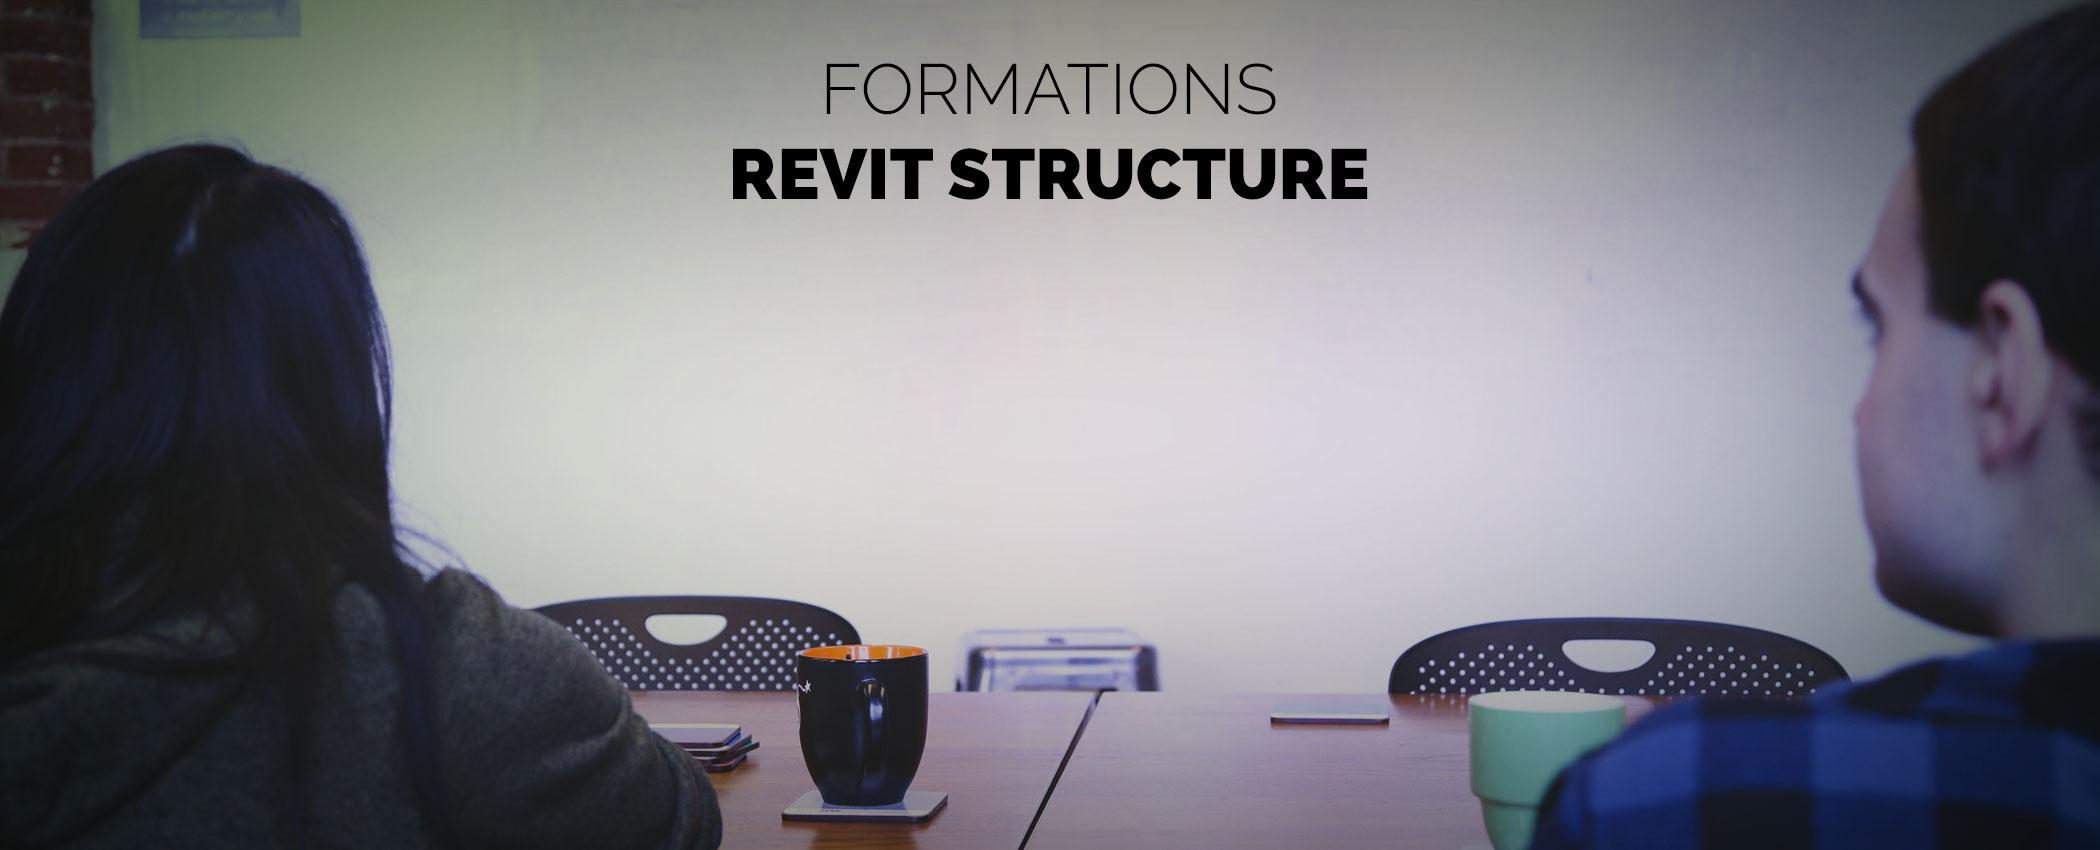 Formation Revit Structure